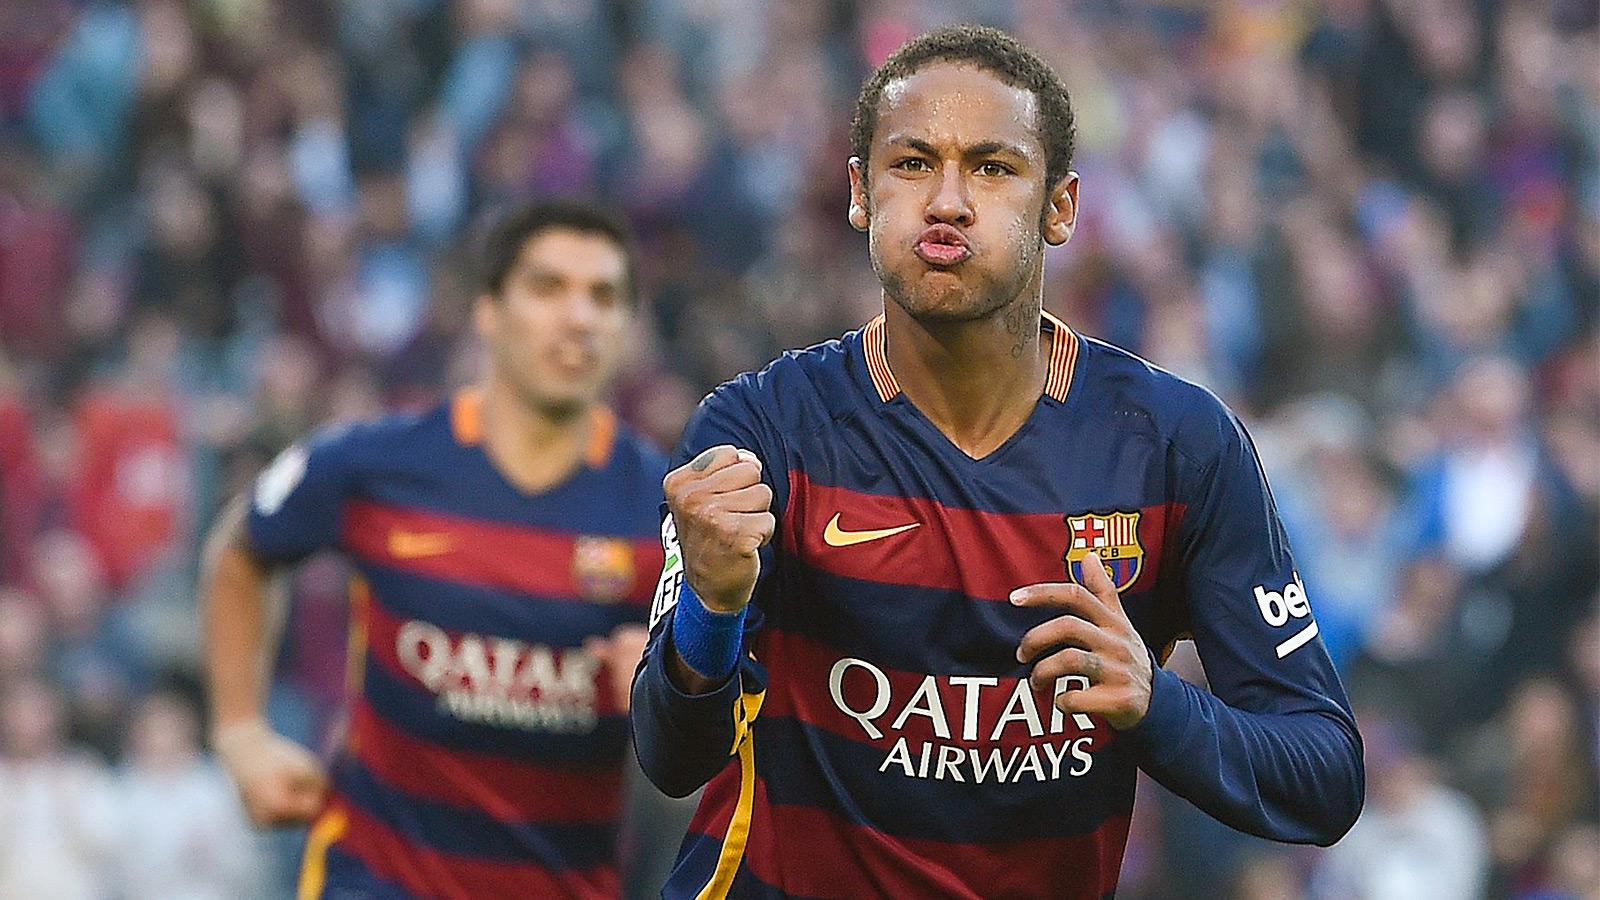 Neymar powers Barca to fourth straight win, down Villarreal